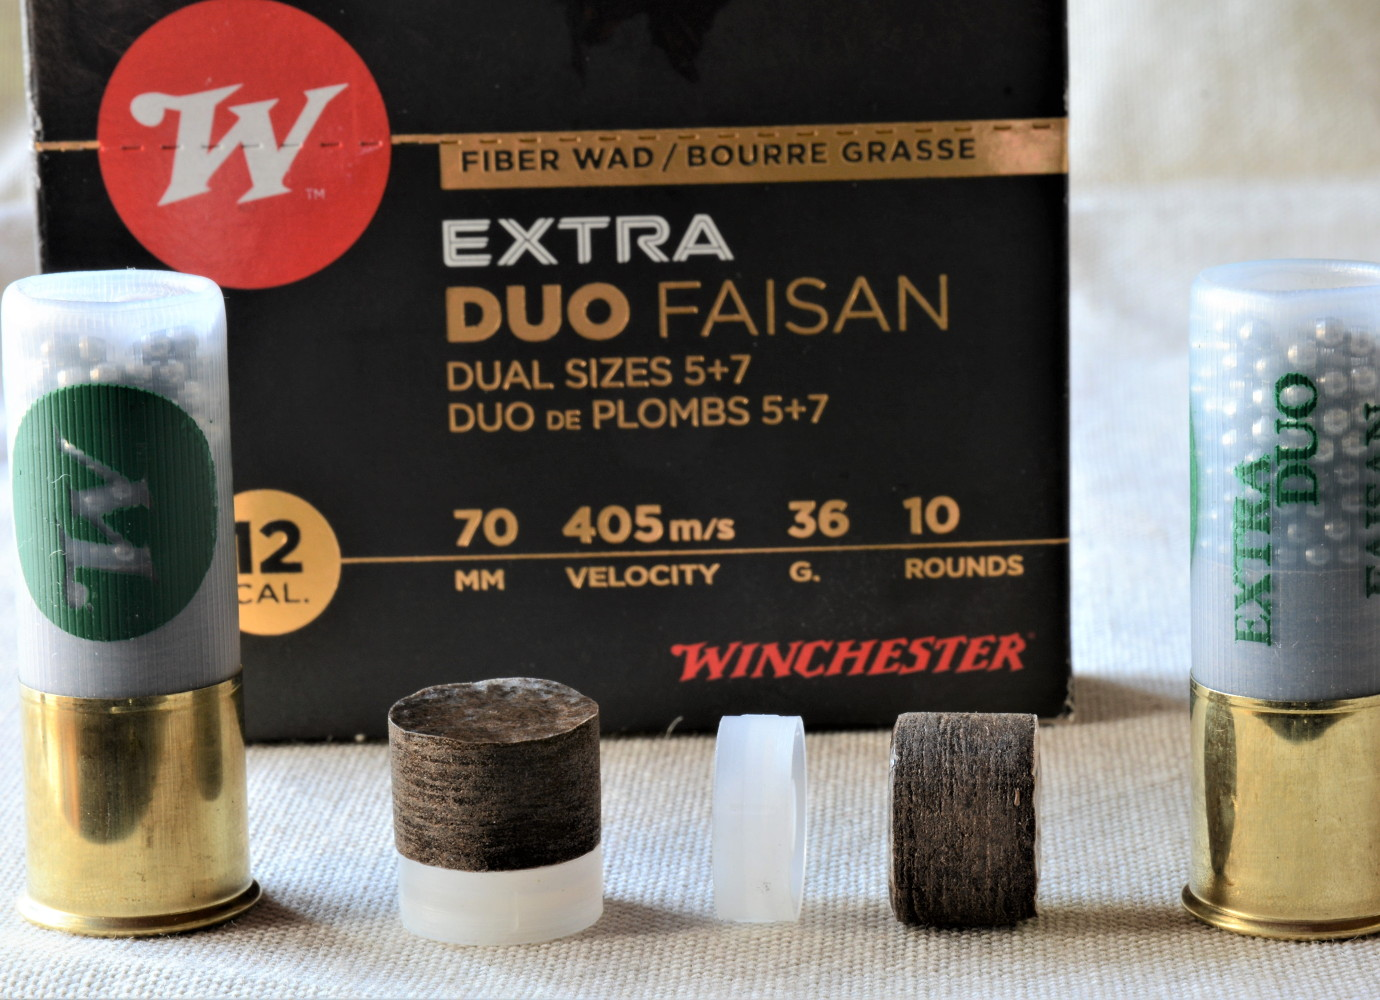 Winchester Extra Duo Faisan calibro 12 il test